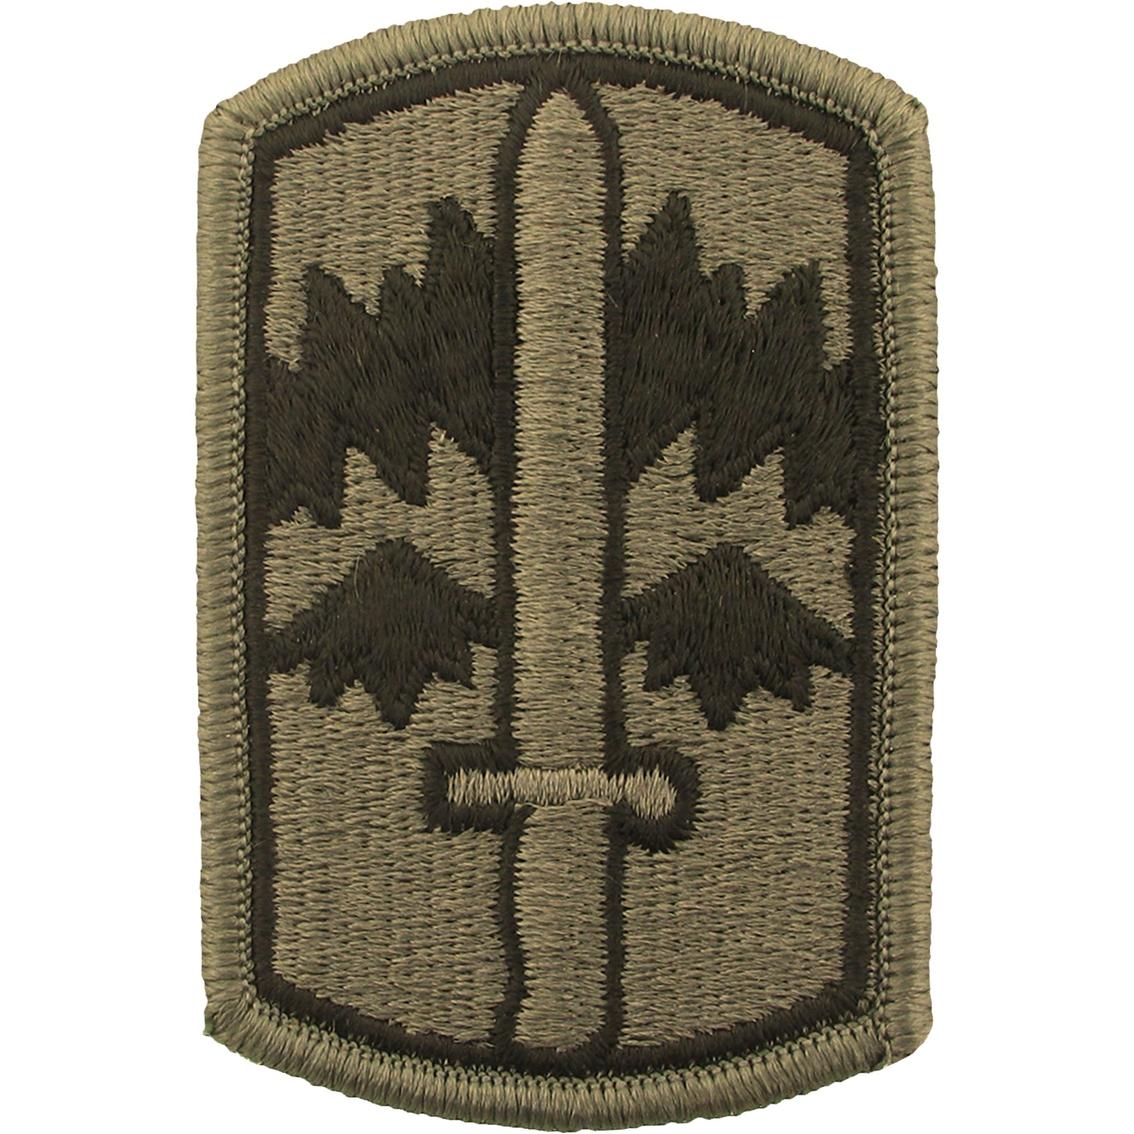 Army Unit Patch 171st Infantry Brigade (ocp)   Ocp Unit